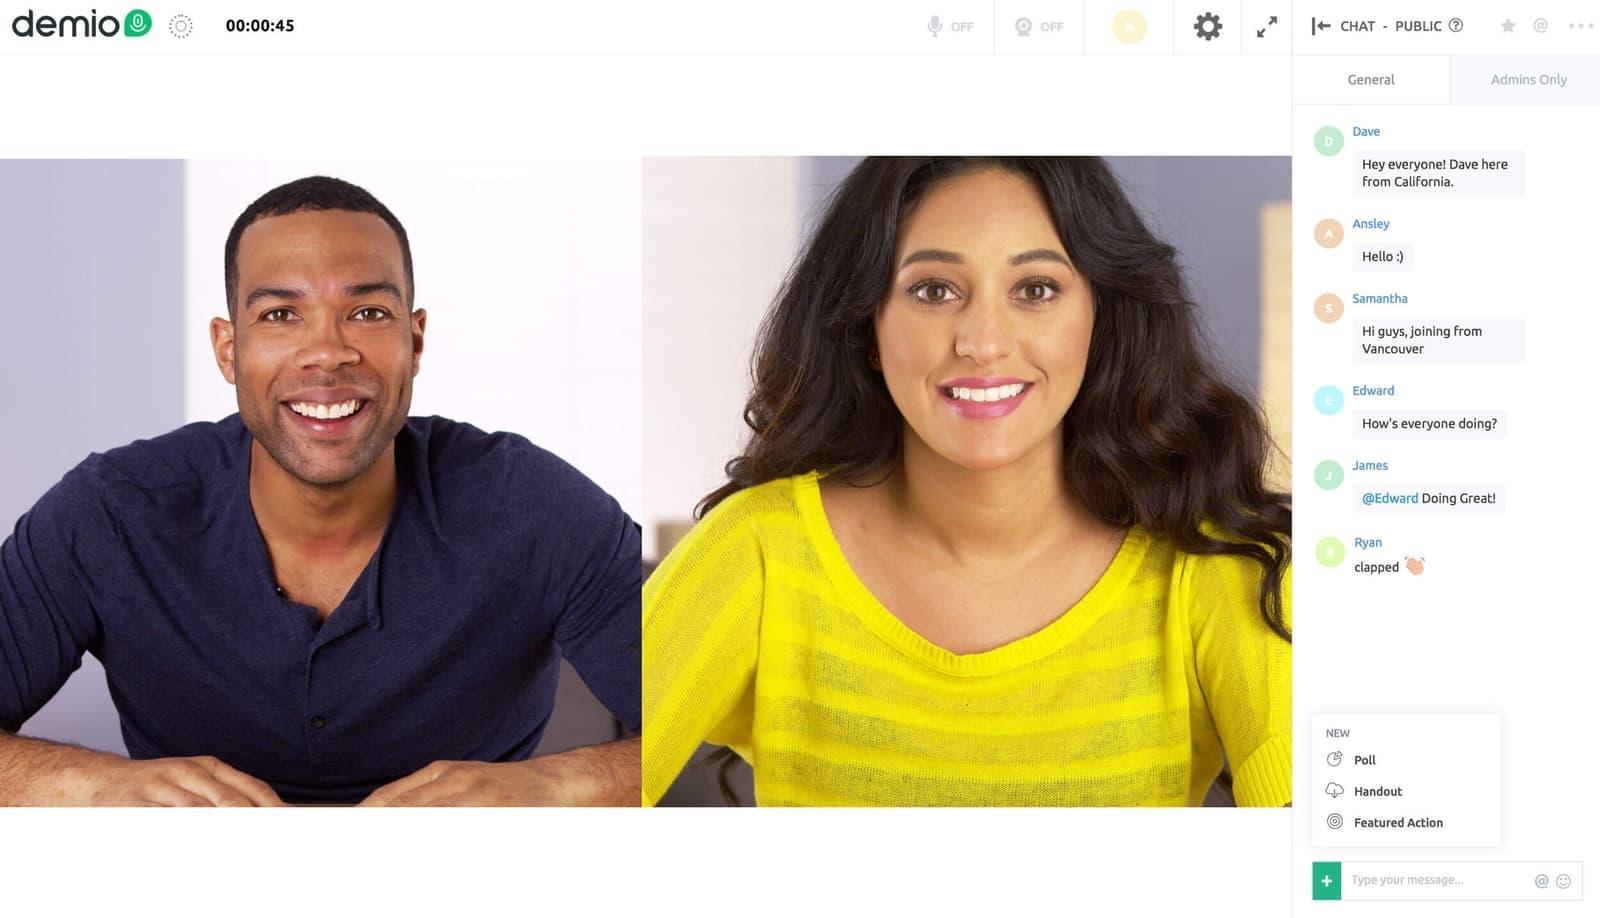 demio webinar screenshot